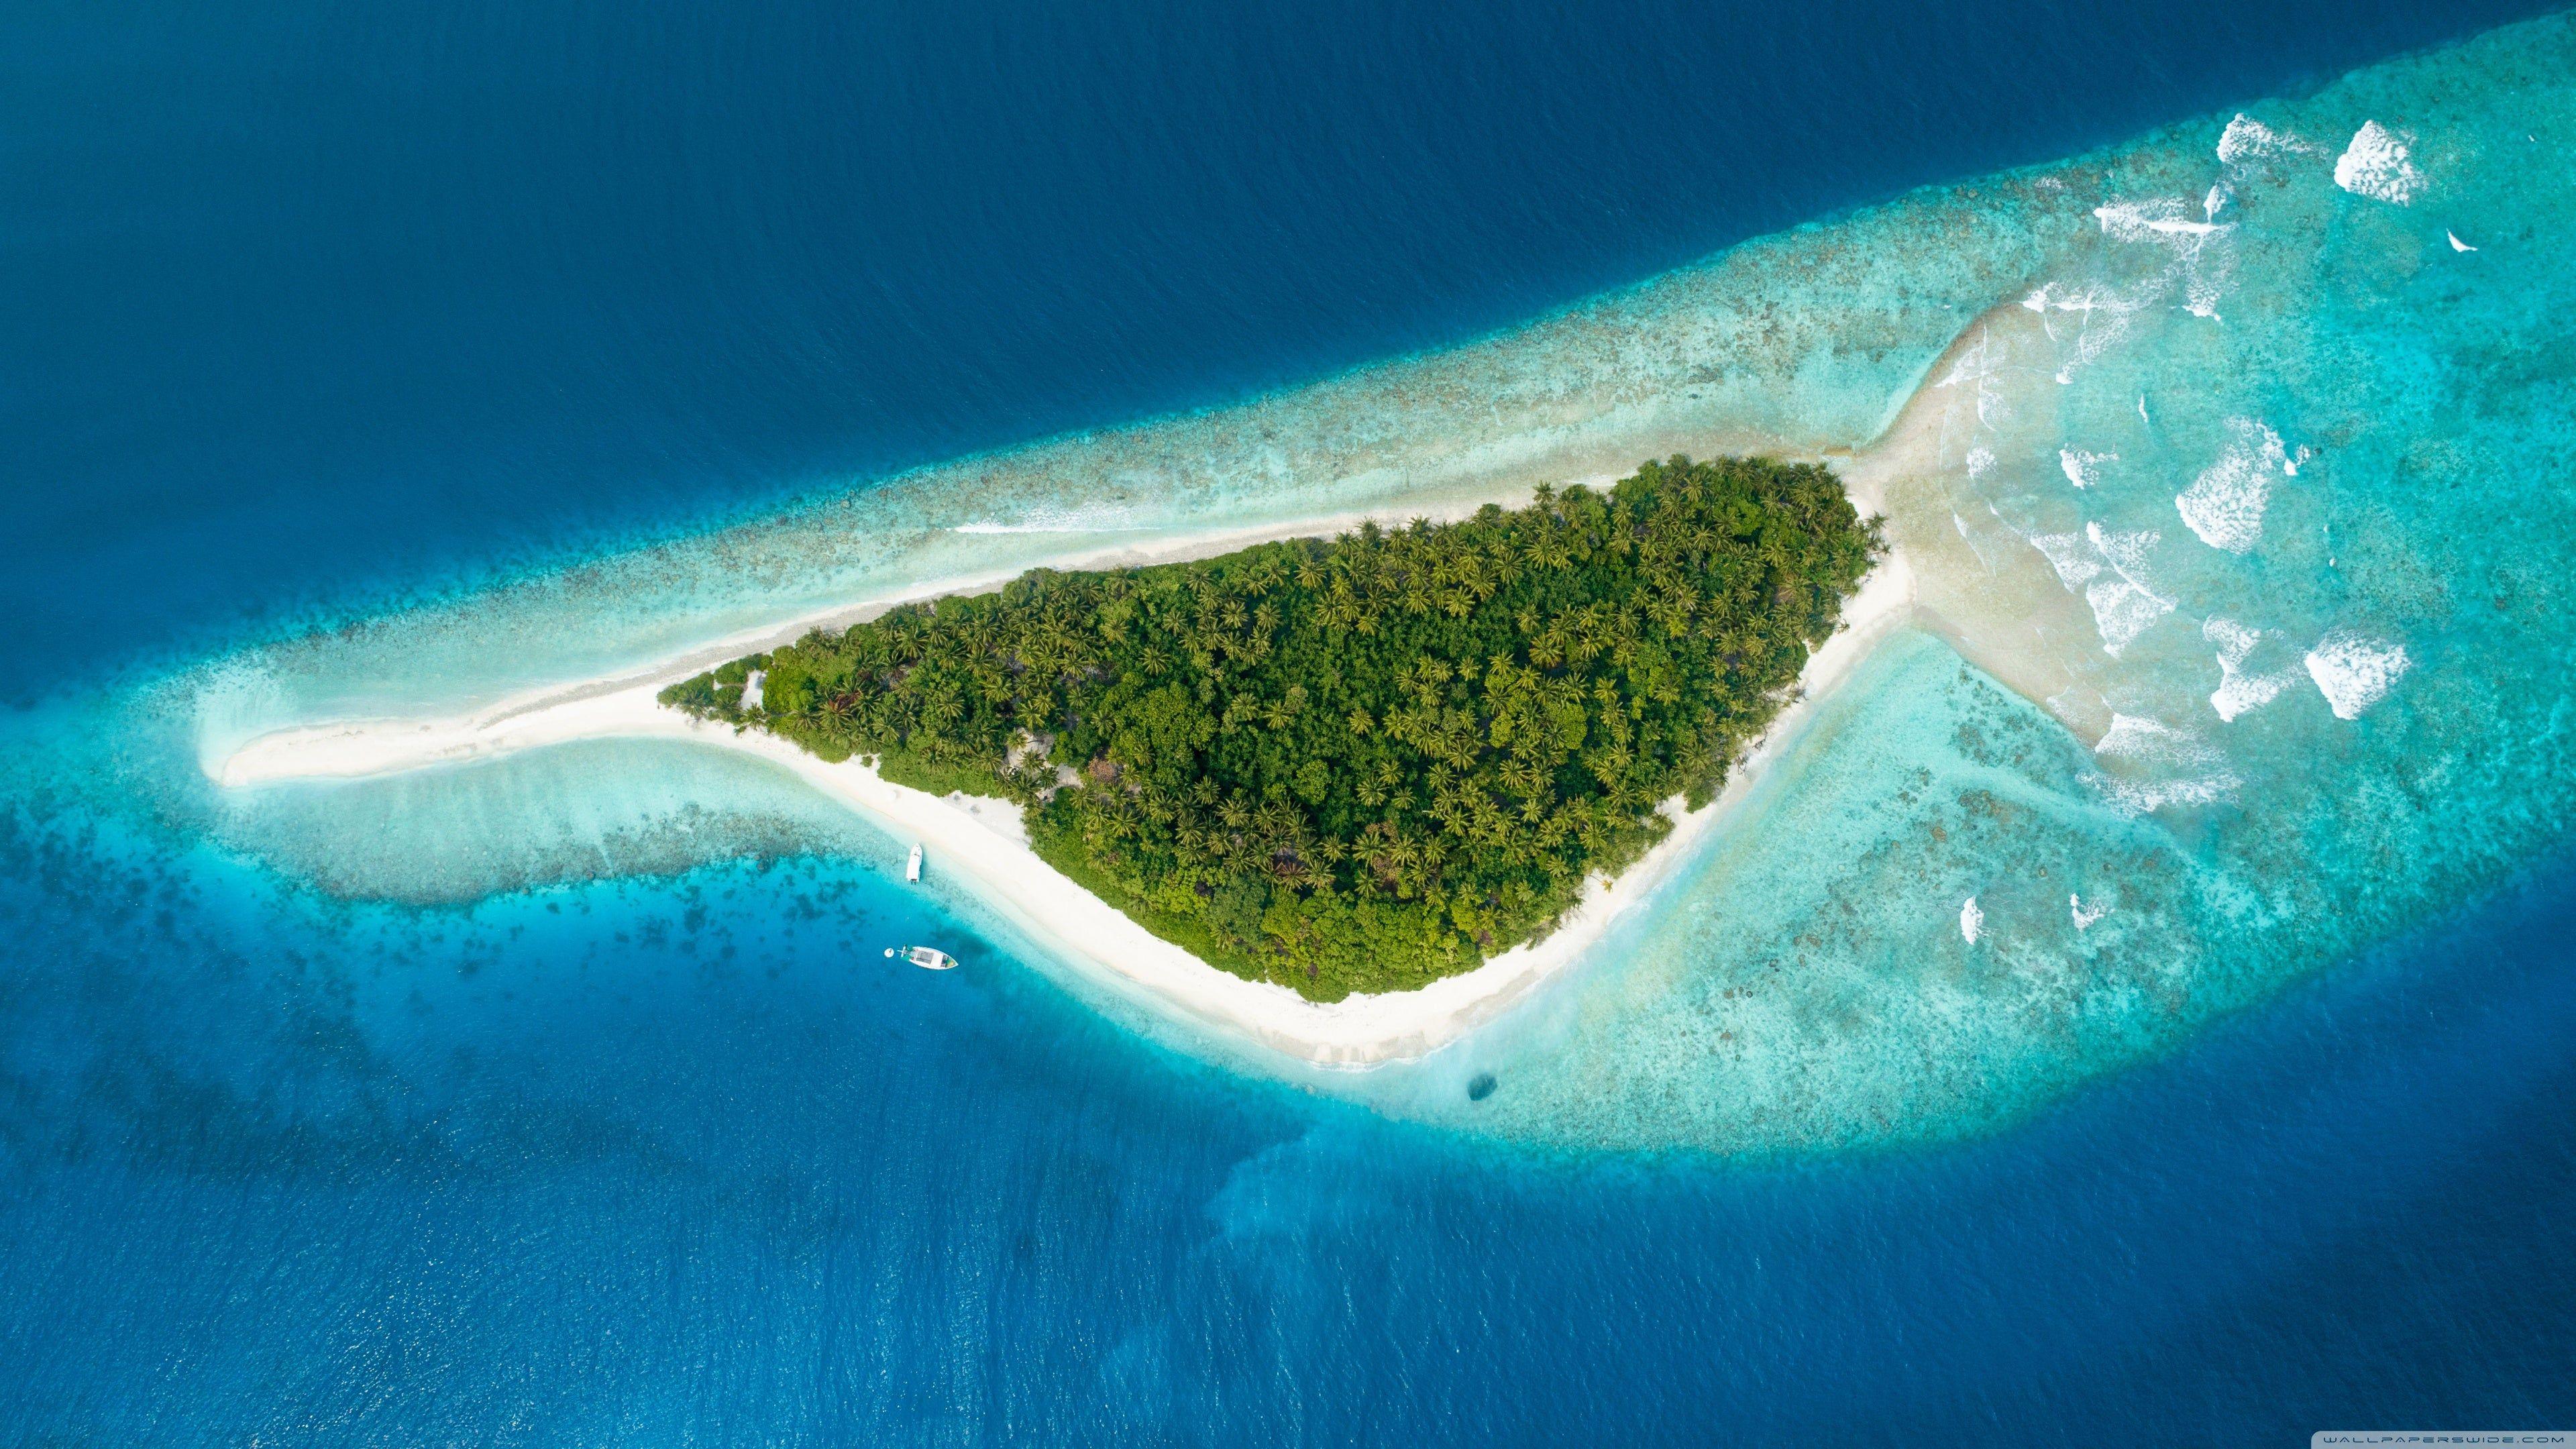 Maldive Fish Island Aerial 4k Wallpaper Beach Pictures Aerial Photography Beaches In The World Island beach sea drone hd image